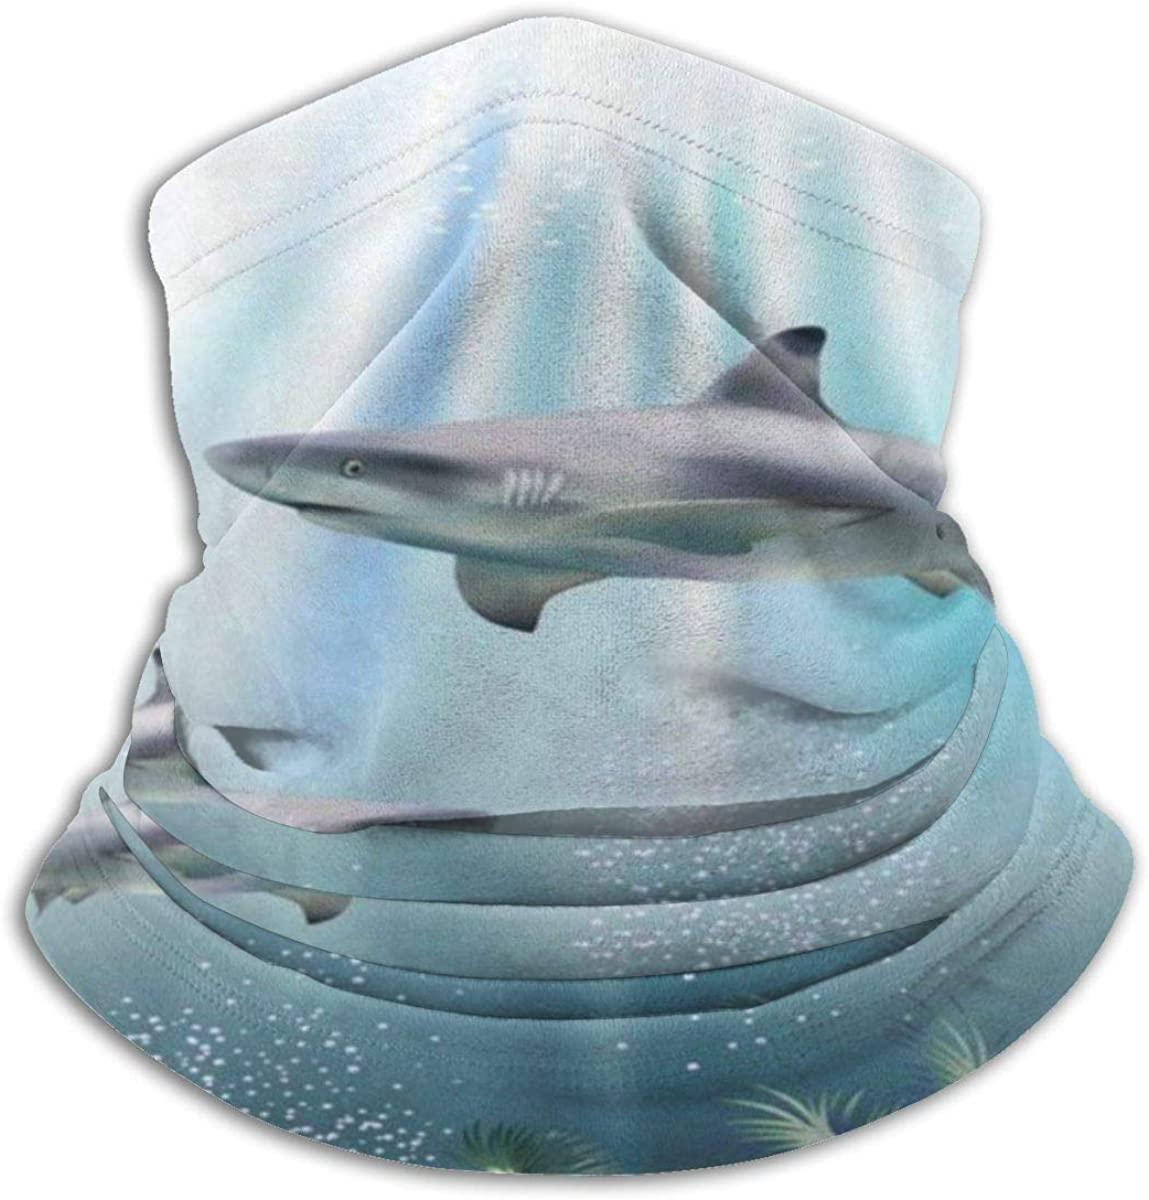 Face Mask, Neck Gaiter, Ocean Two Dolphins Bandana, Balaclava Windproof,Anti Dust Magic Scarf for Women Men